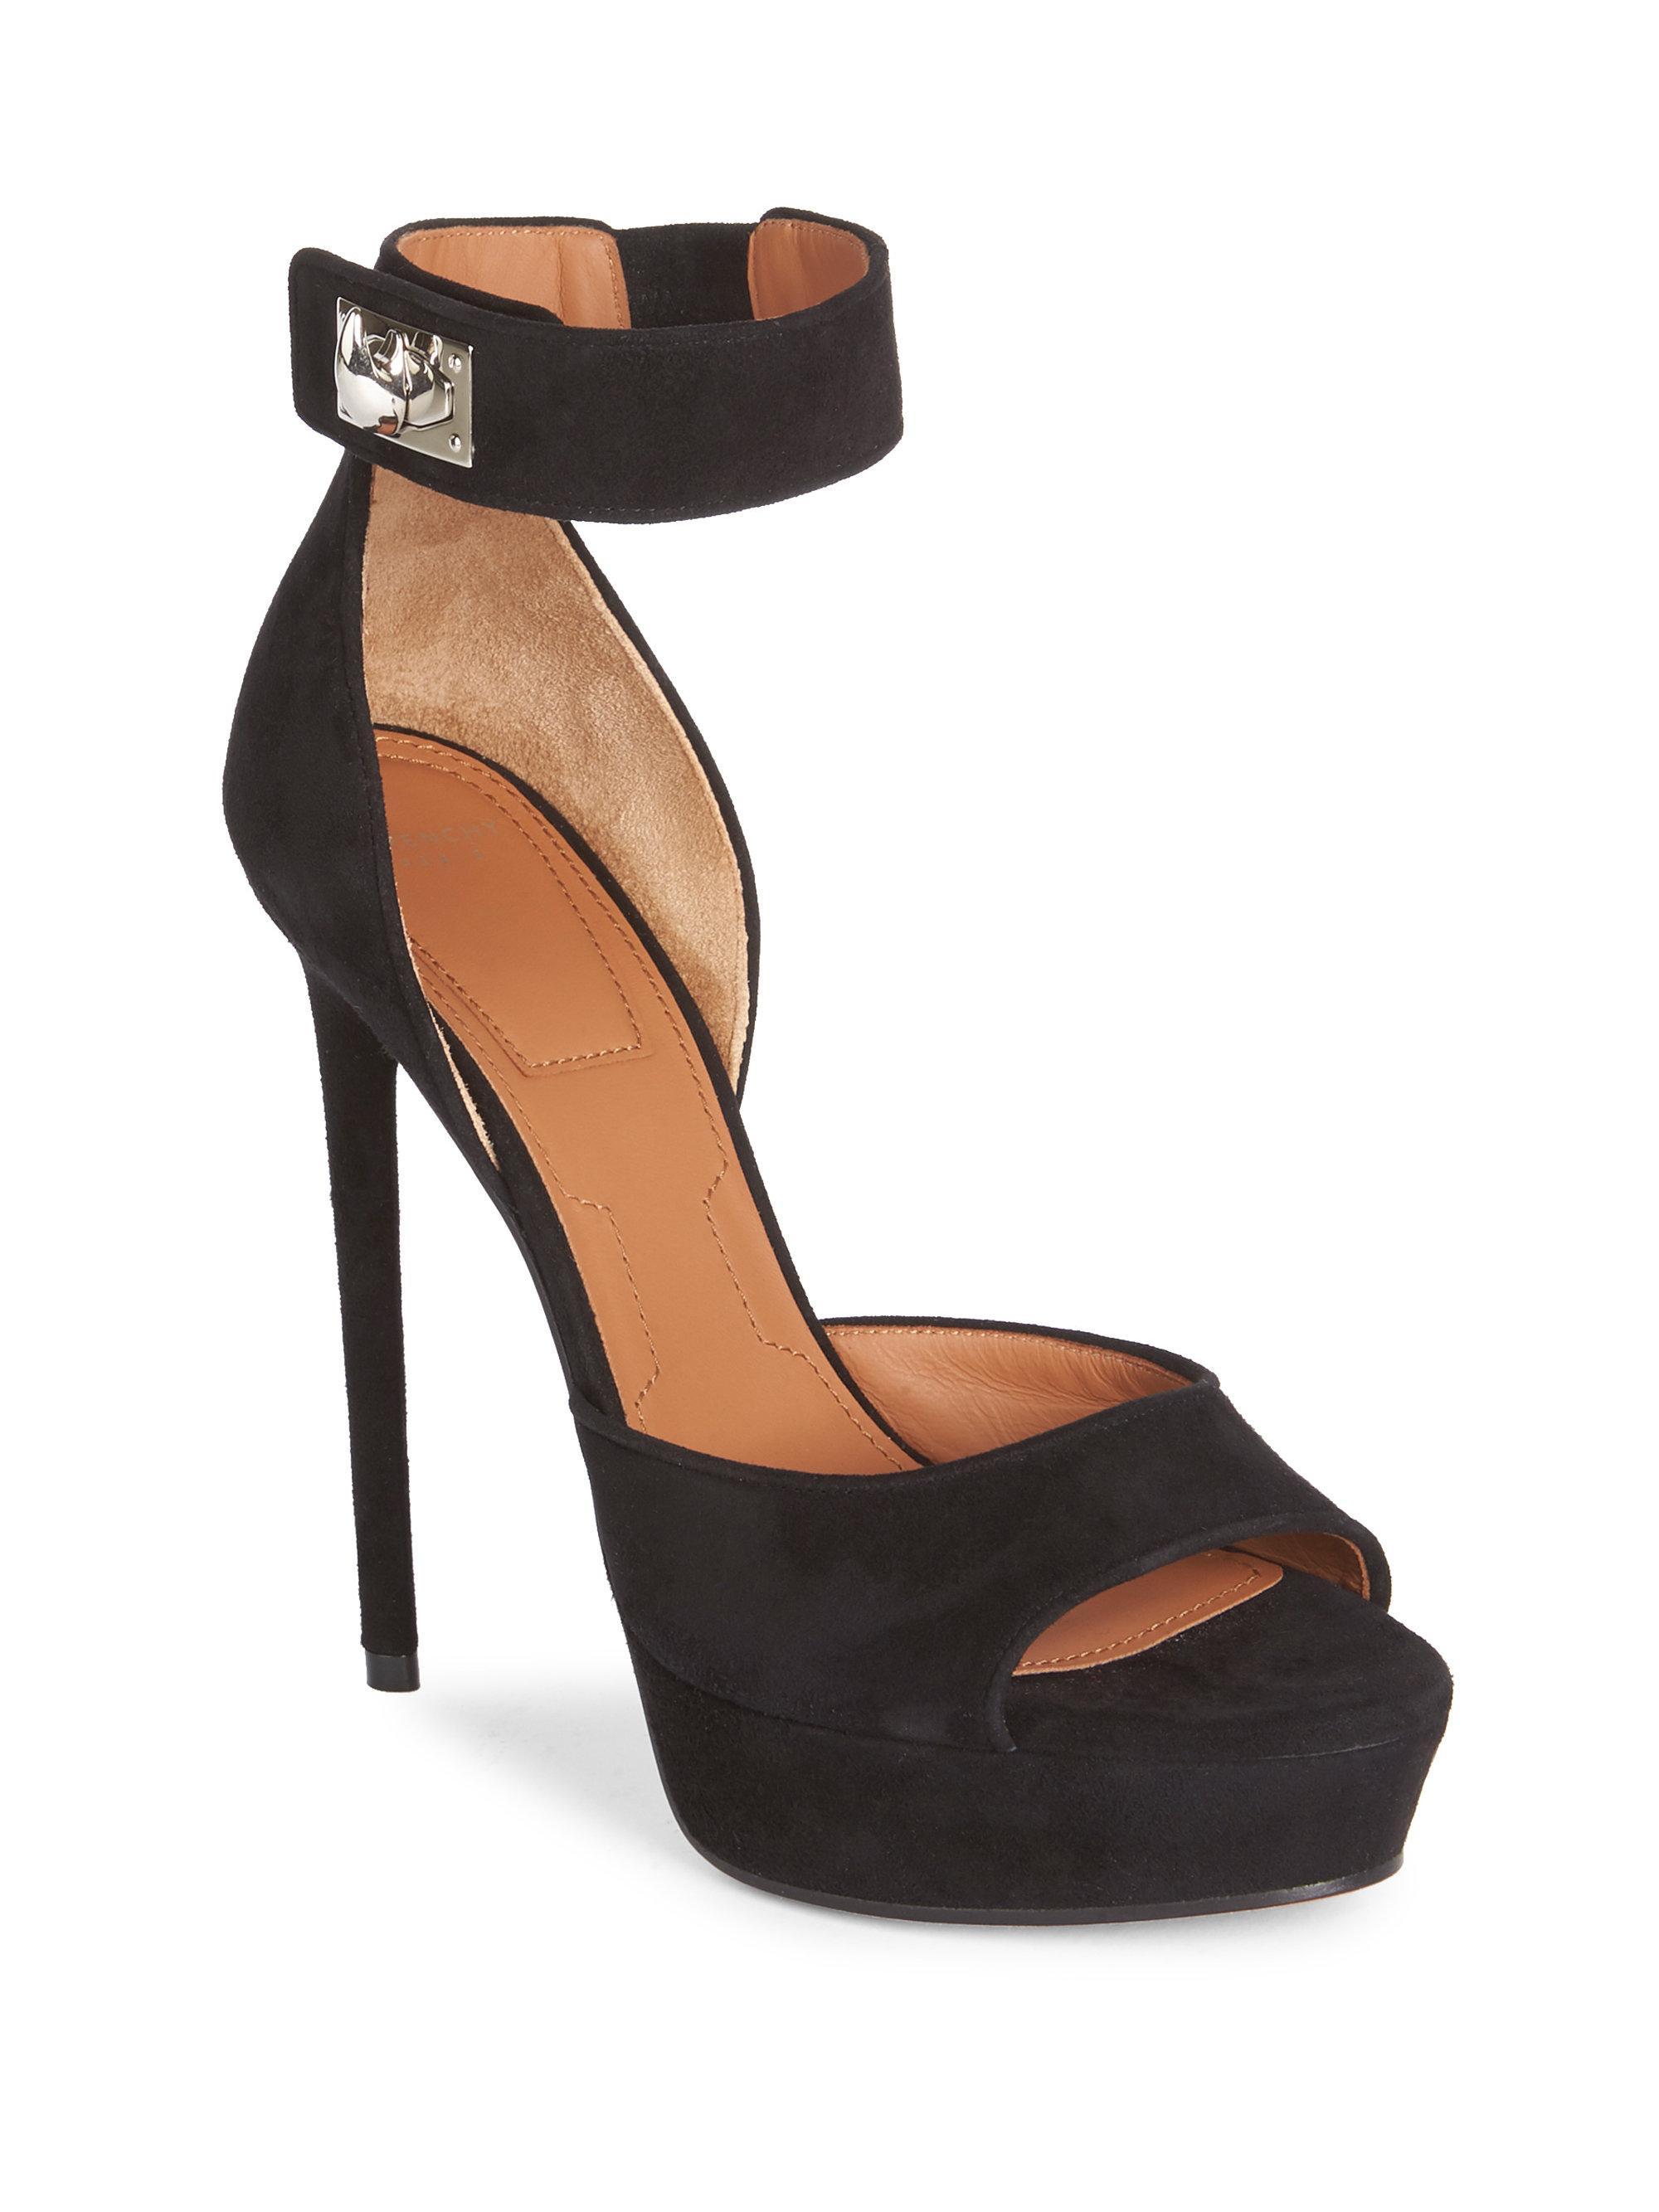 4e5c99b227f4 Lyst - Givenchy Suede Shark-lock Platform Sandals in Black